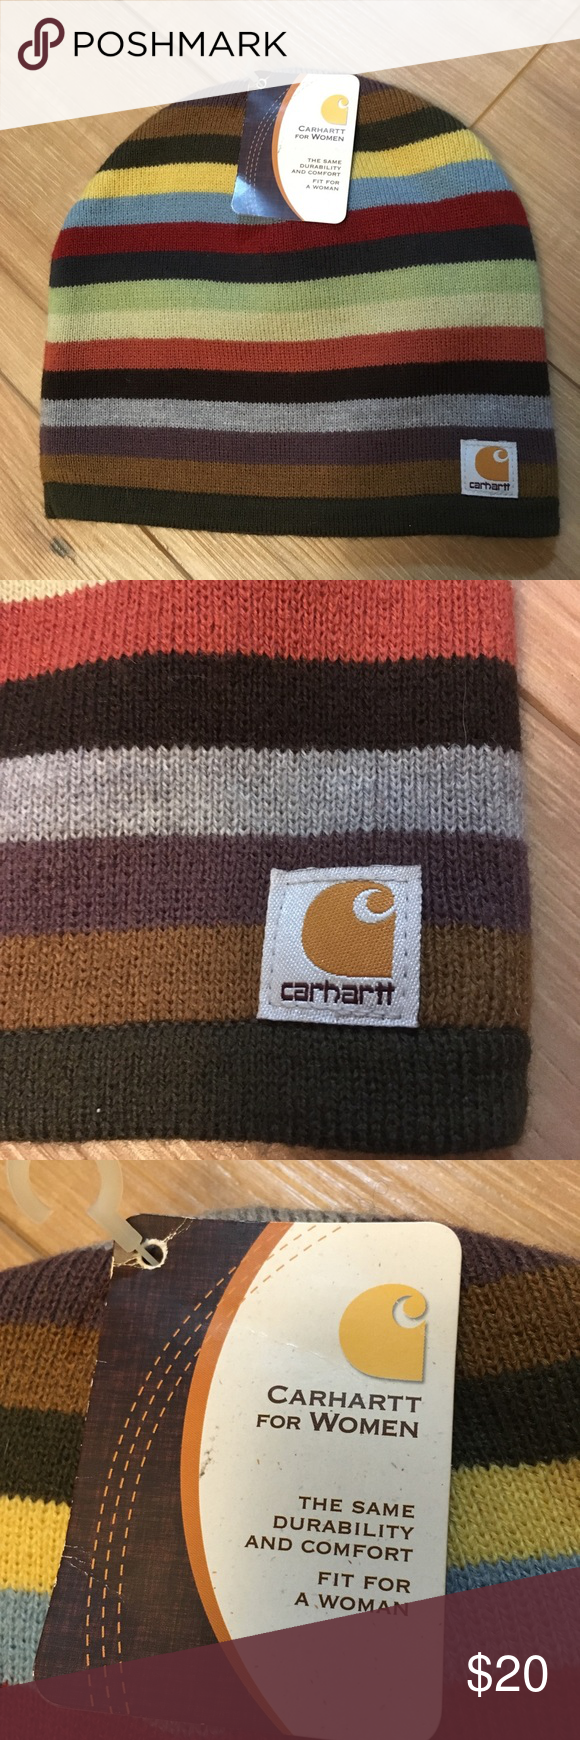 NWT Carhartt Women's Beanie New fleece lined beanie made specifically for women. Carhartt Accessories Hats #carharttwomen NWT Carhartt Women's Beanie New fleece lined beanie made specifically for women. Carhartt Accessories Hats #carharttwomen